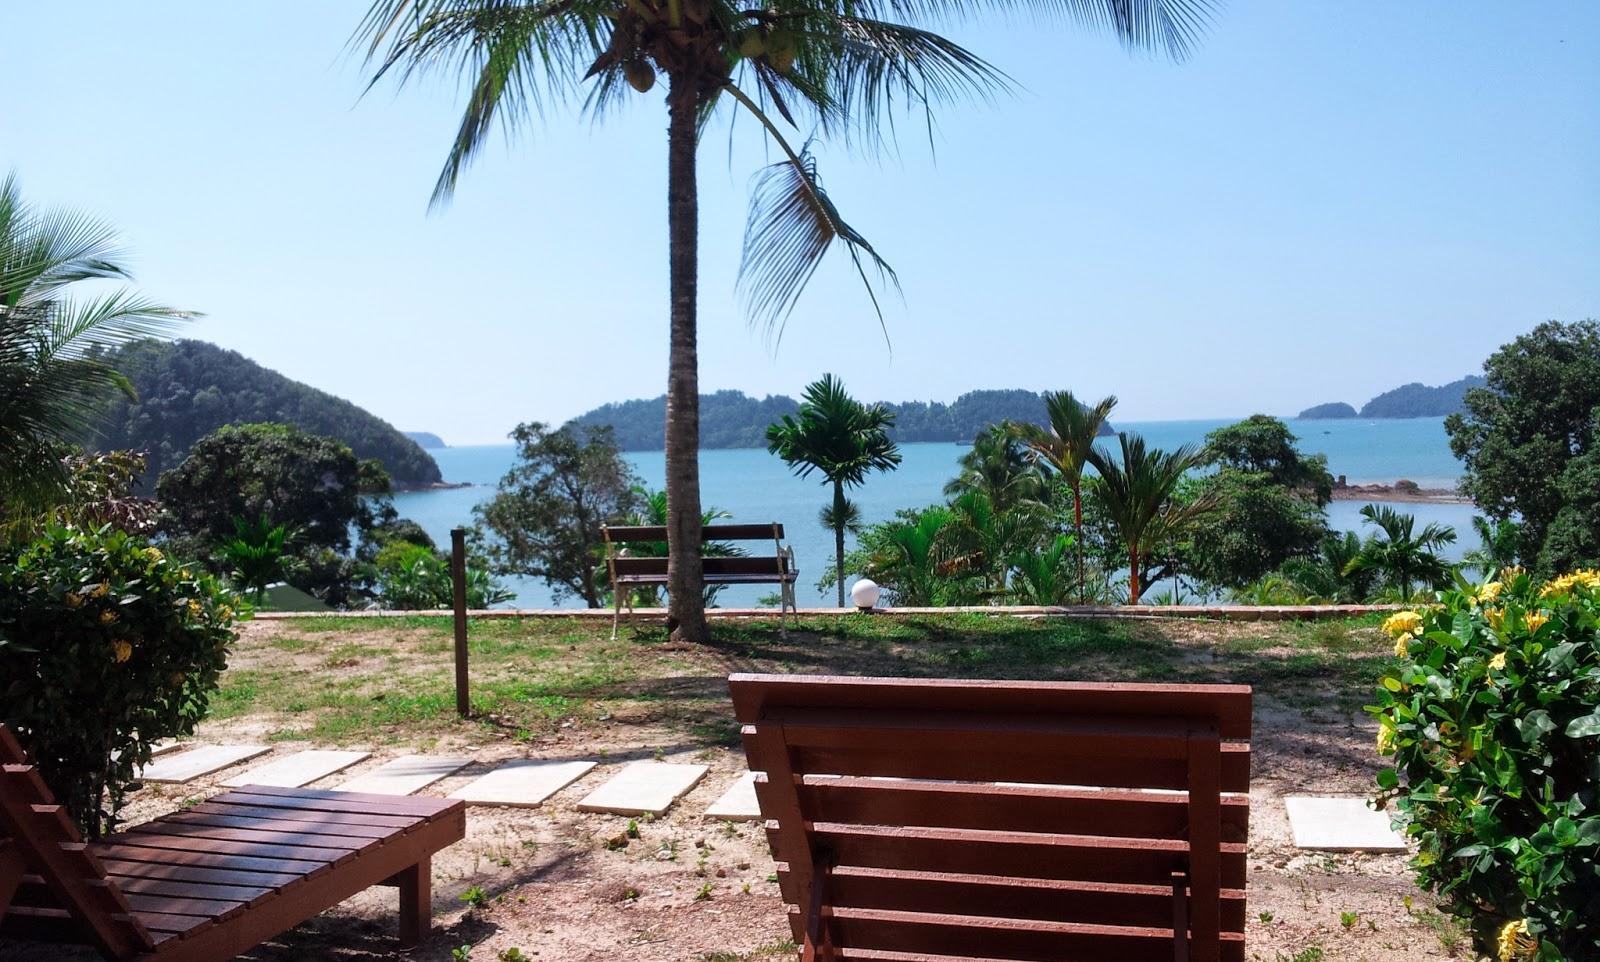 Coretan Pengembaraan Endau Beach Resort Pantai Penyabong